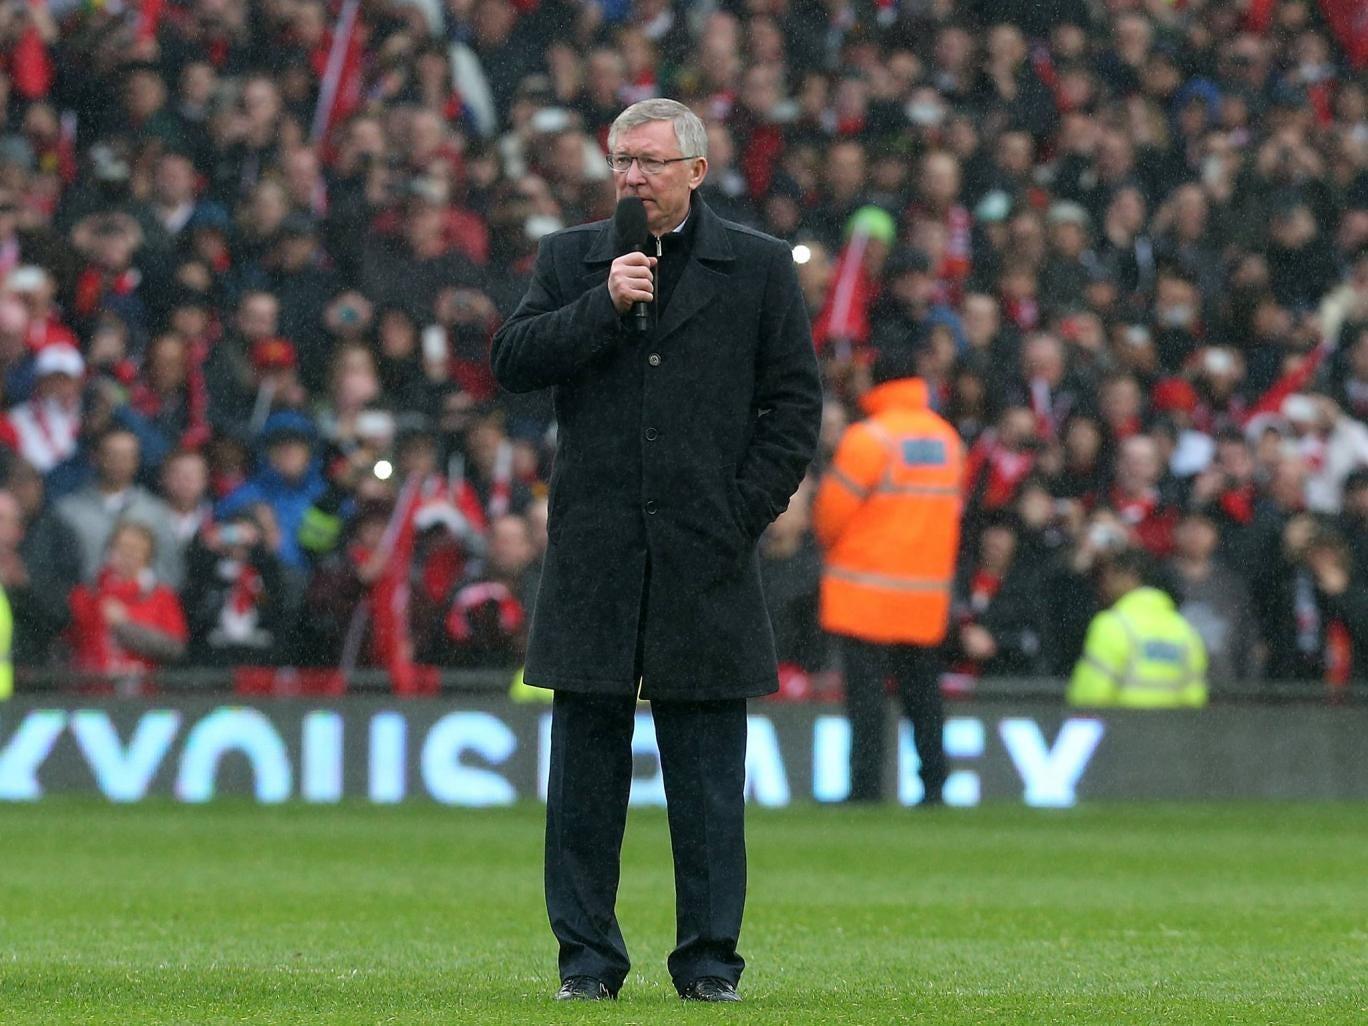 Sir Alex Ferguson addresses the onlooking Manchester United crowd